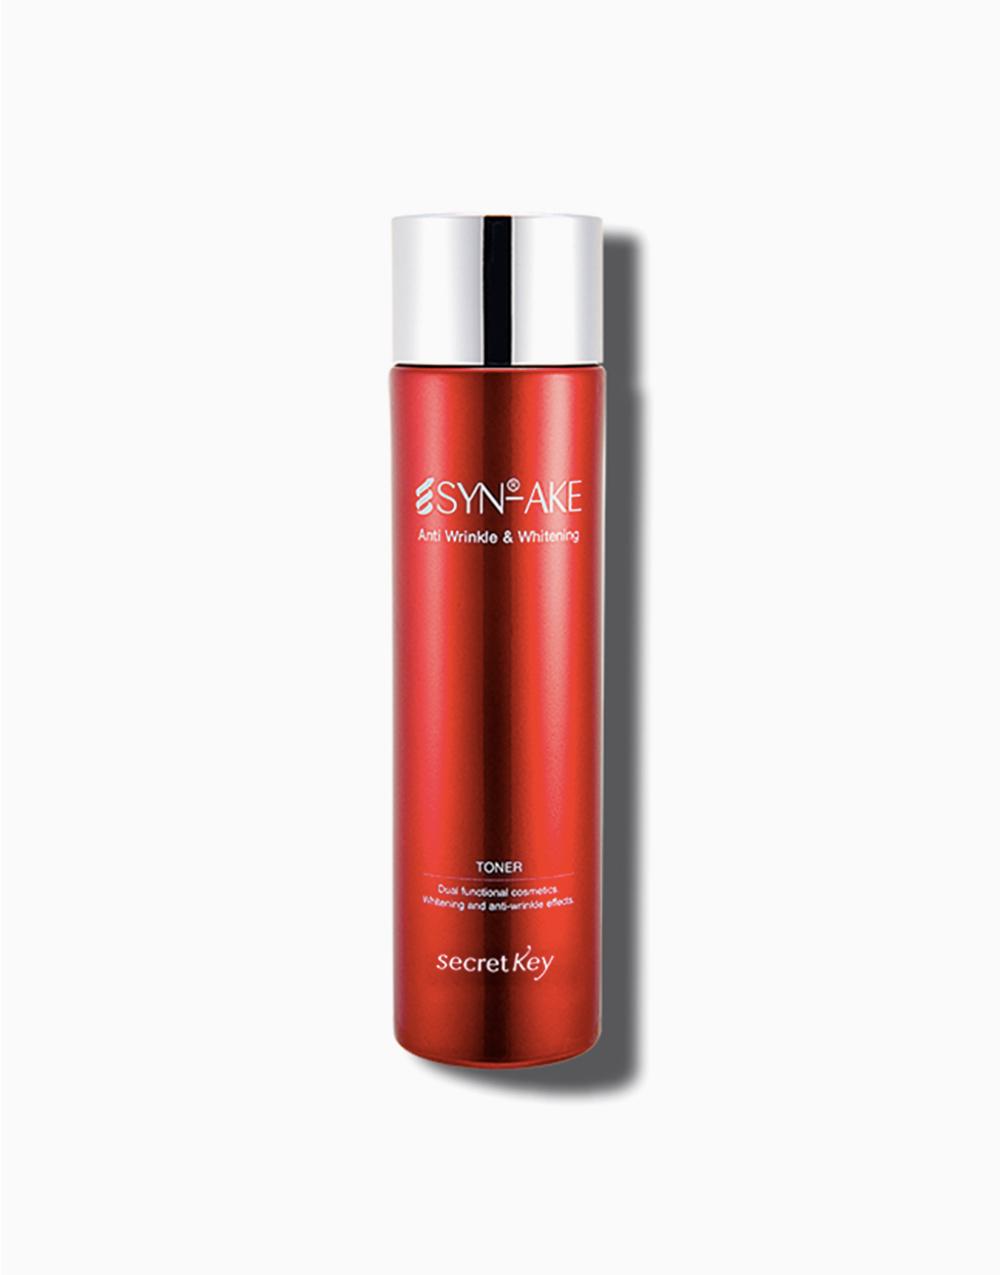 Syn-ake Anti Wrinkle & Whitening Toner by Secret Key